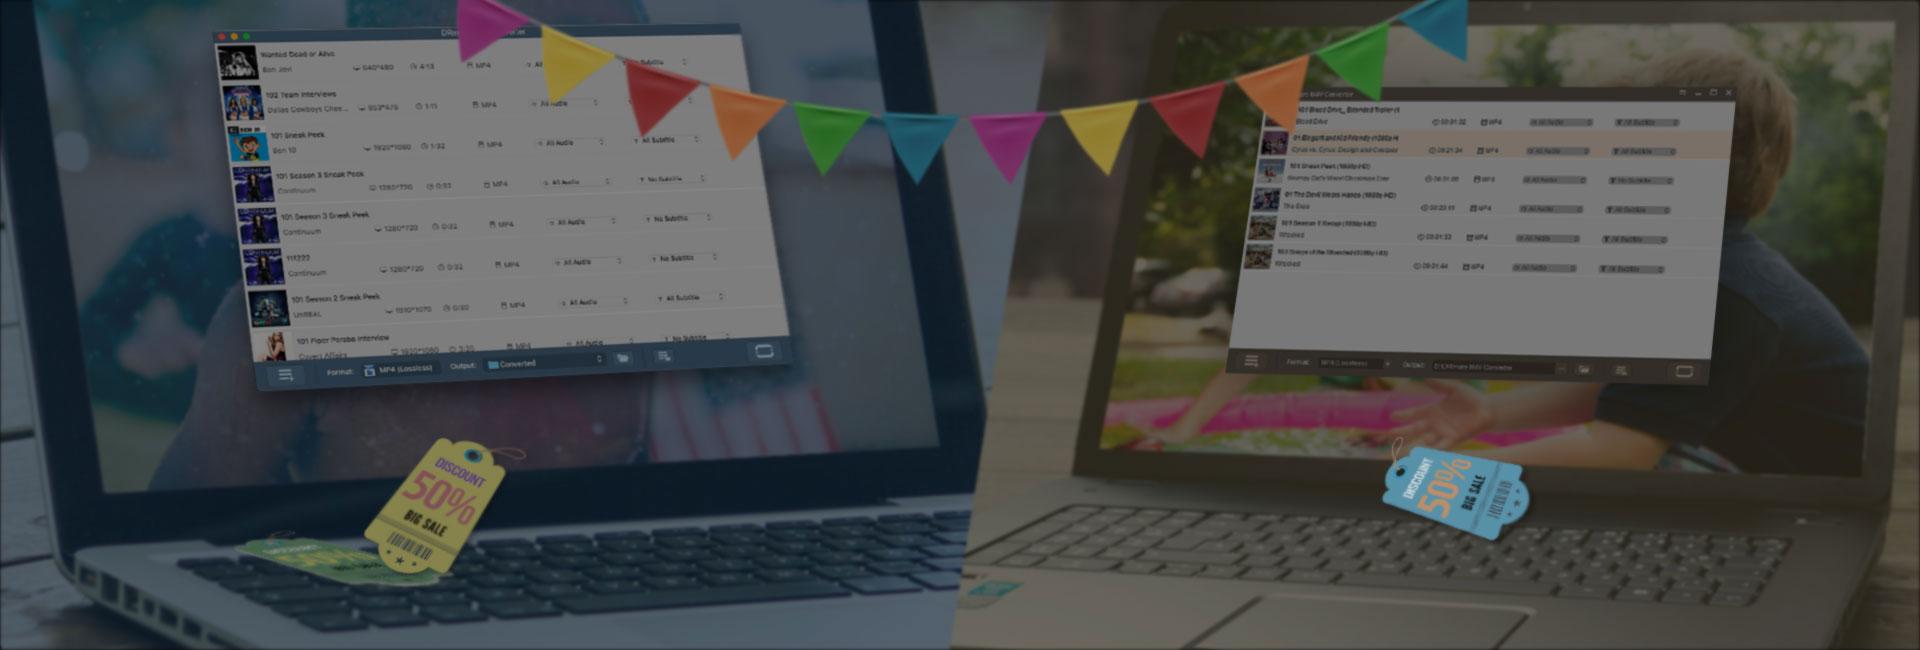 DRmare M4V Converte for Mac 2.1.2 破解版 - iTunes M4V视频格式转换工具